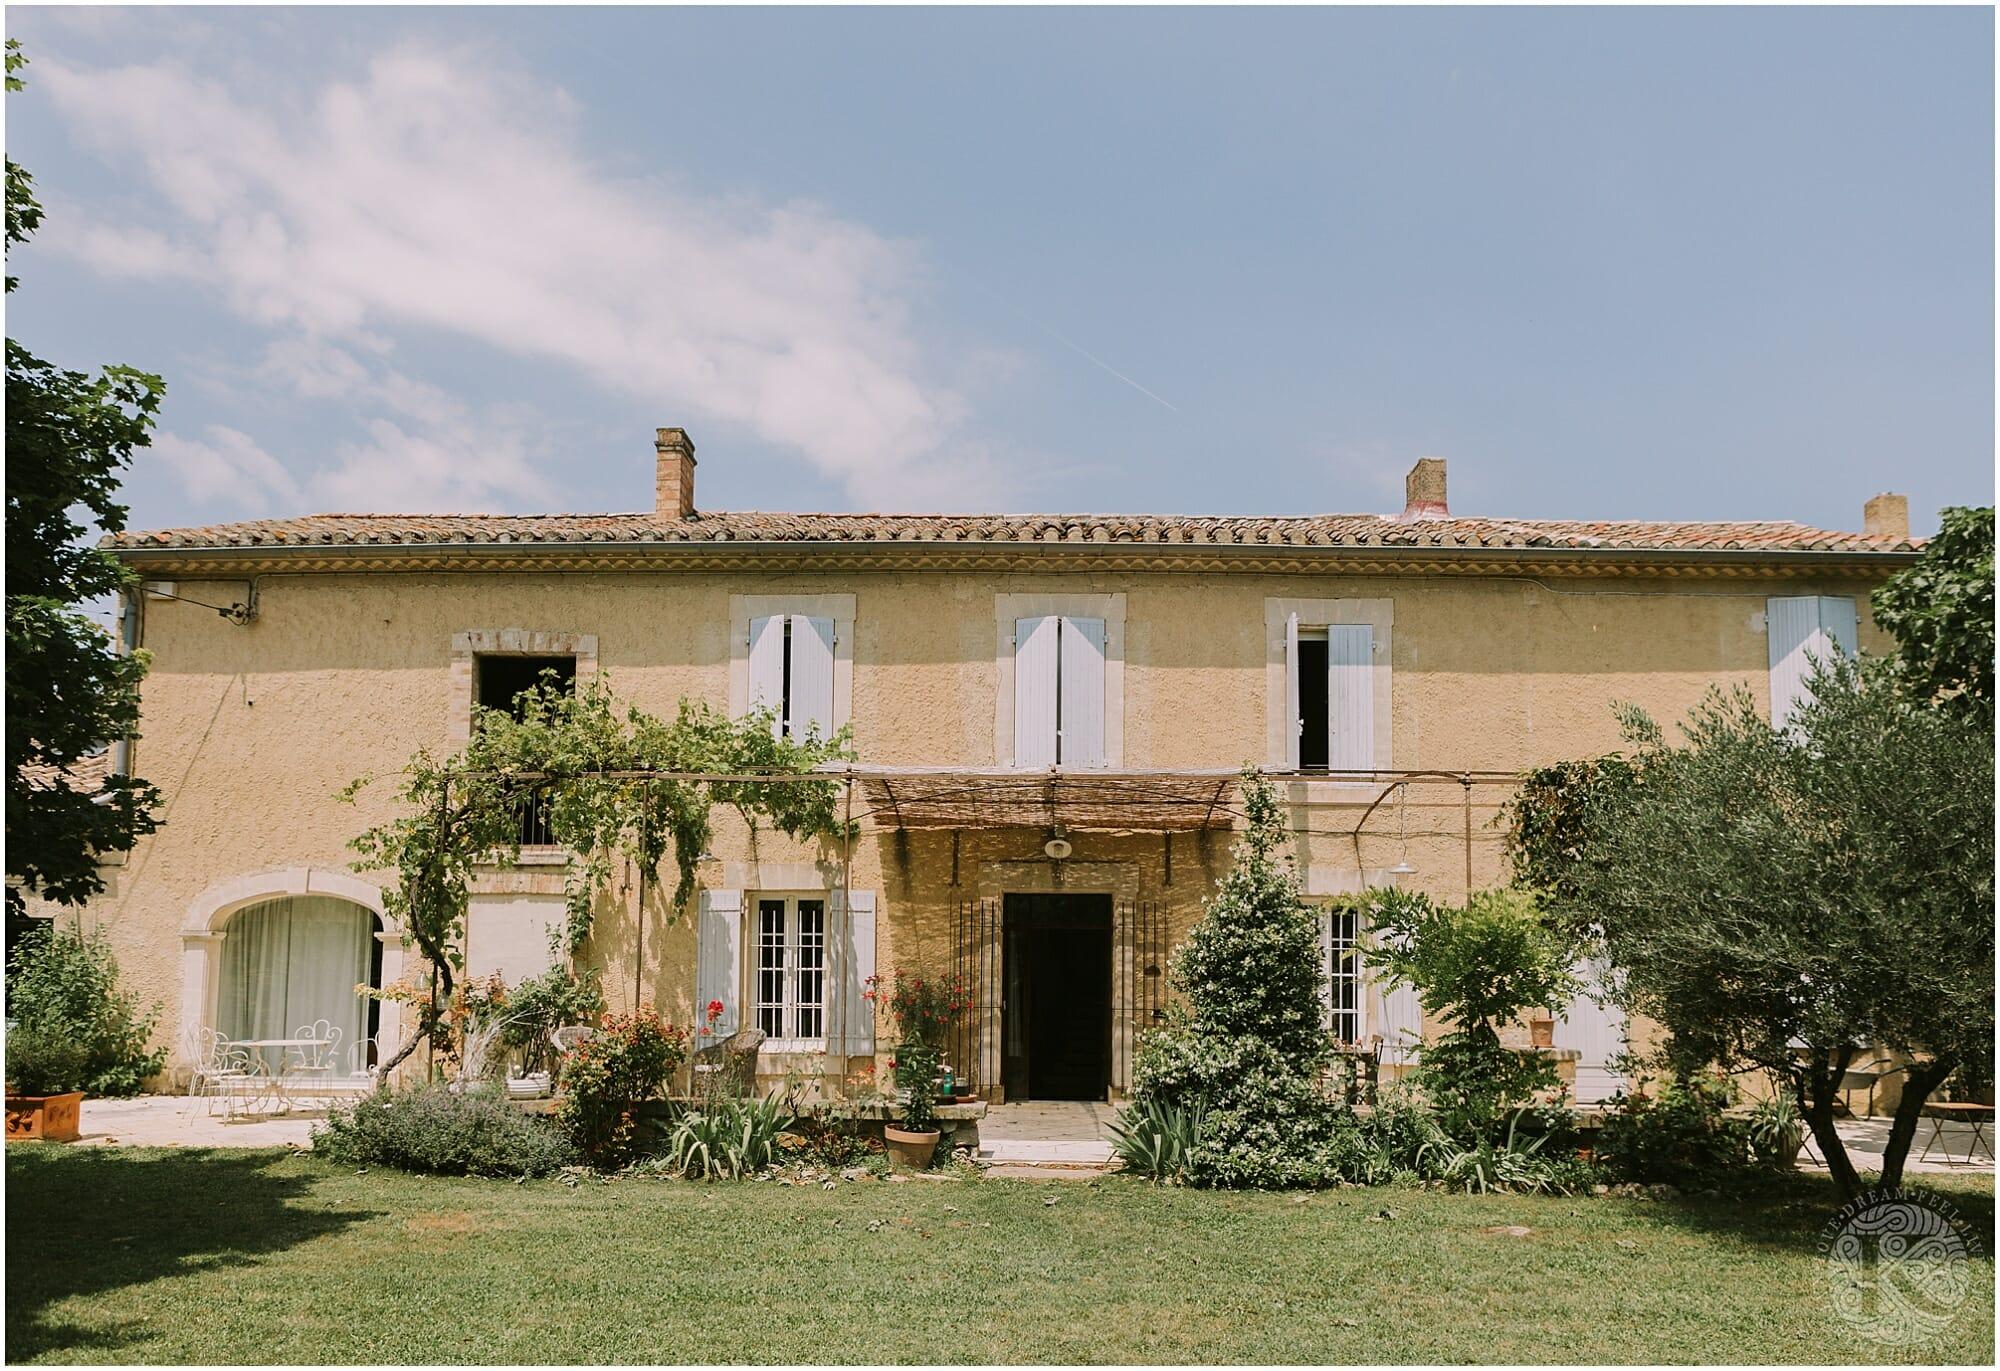 Kateryna-photos-photographe-mariage-chateau-des-3-fontaines-provence-avignon-vaucluse-sud_0008.jpg